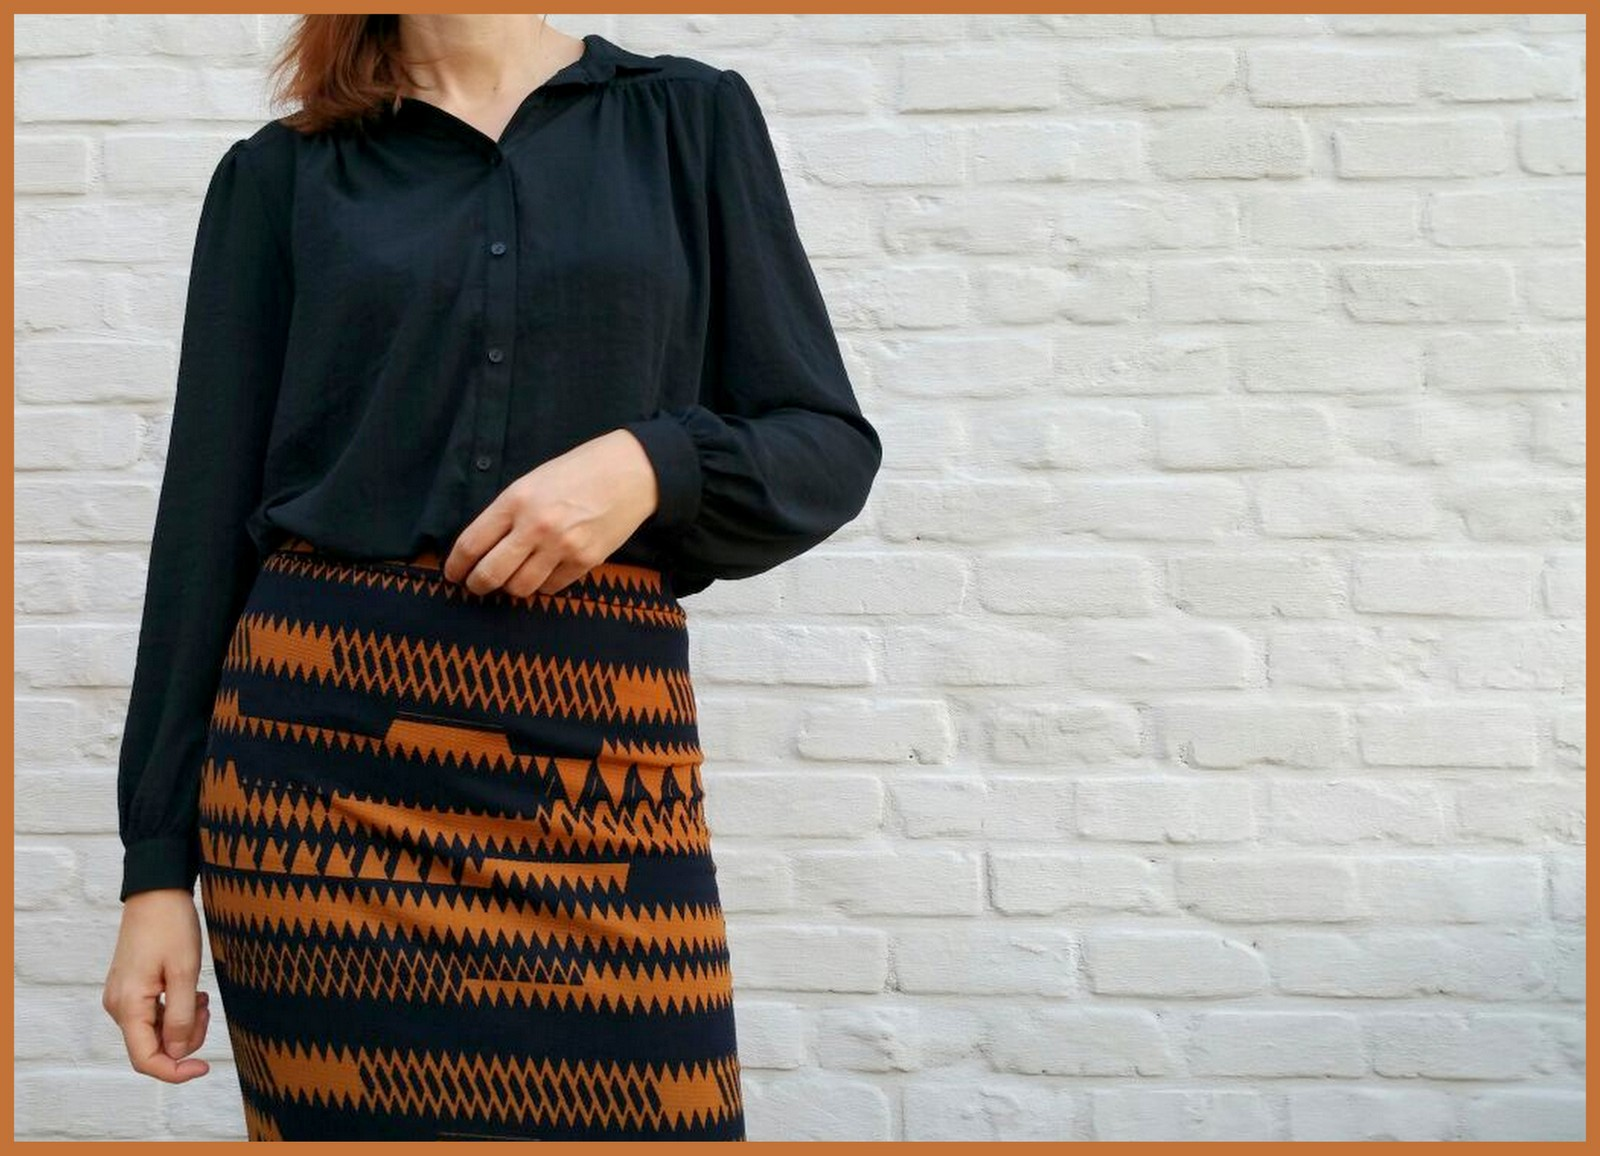 kristy pencil skirt